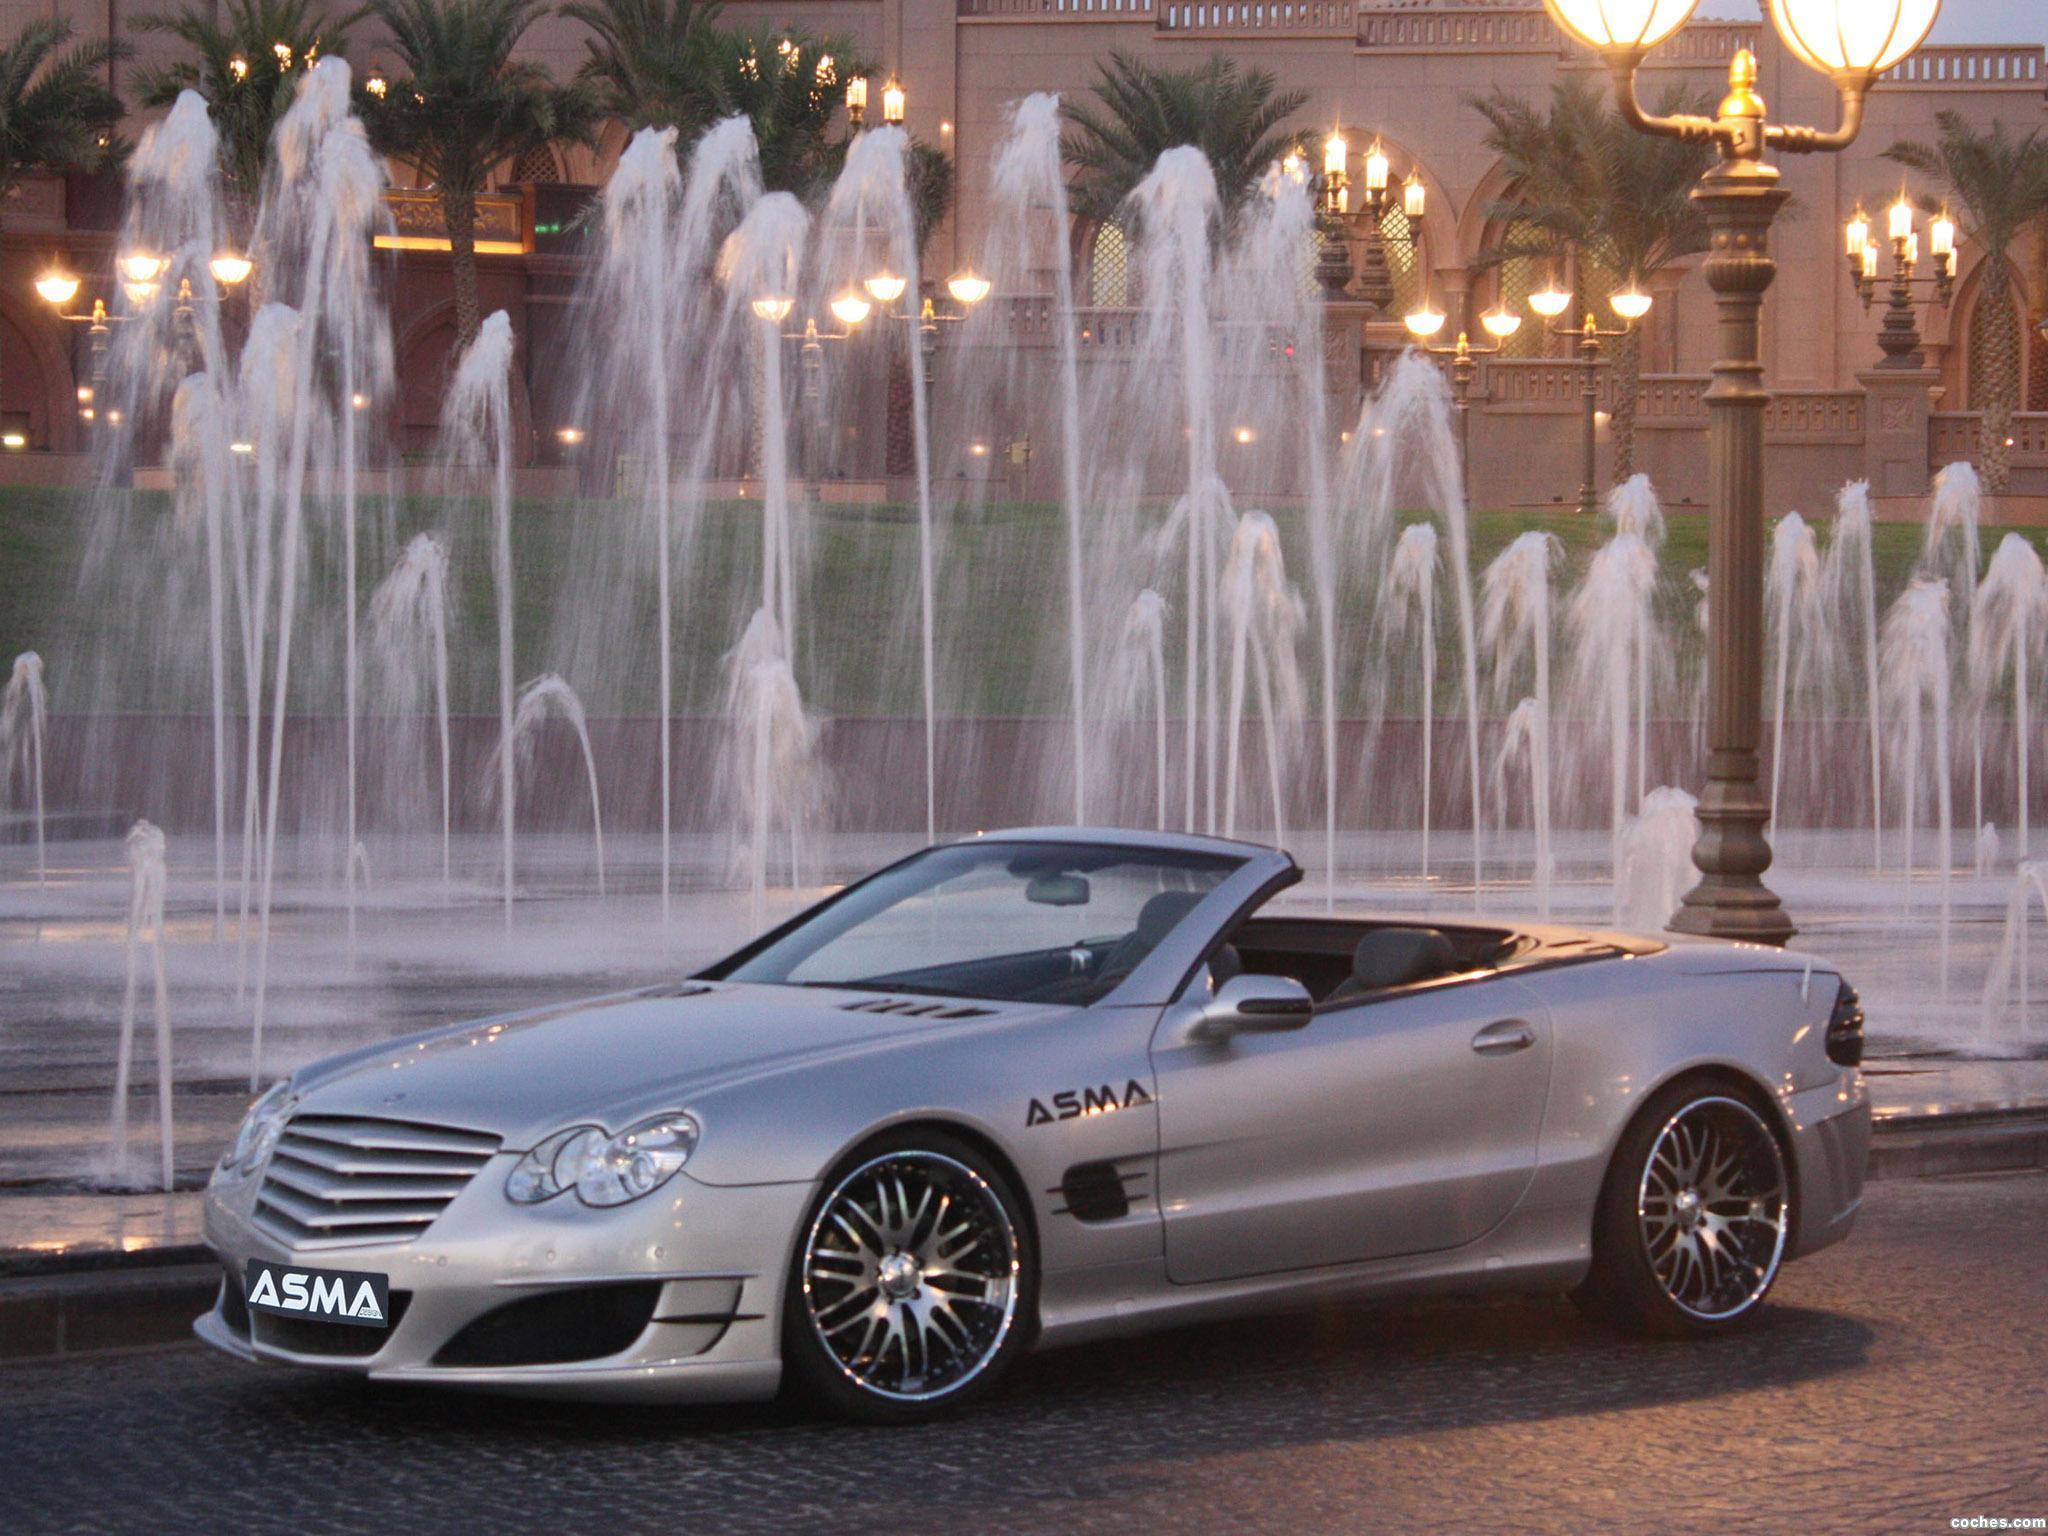 Foto 8 de Mercedes asma SL Sport Edition R230 2009